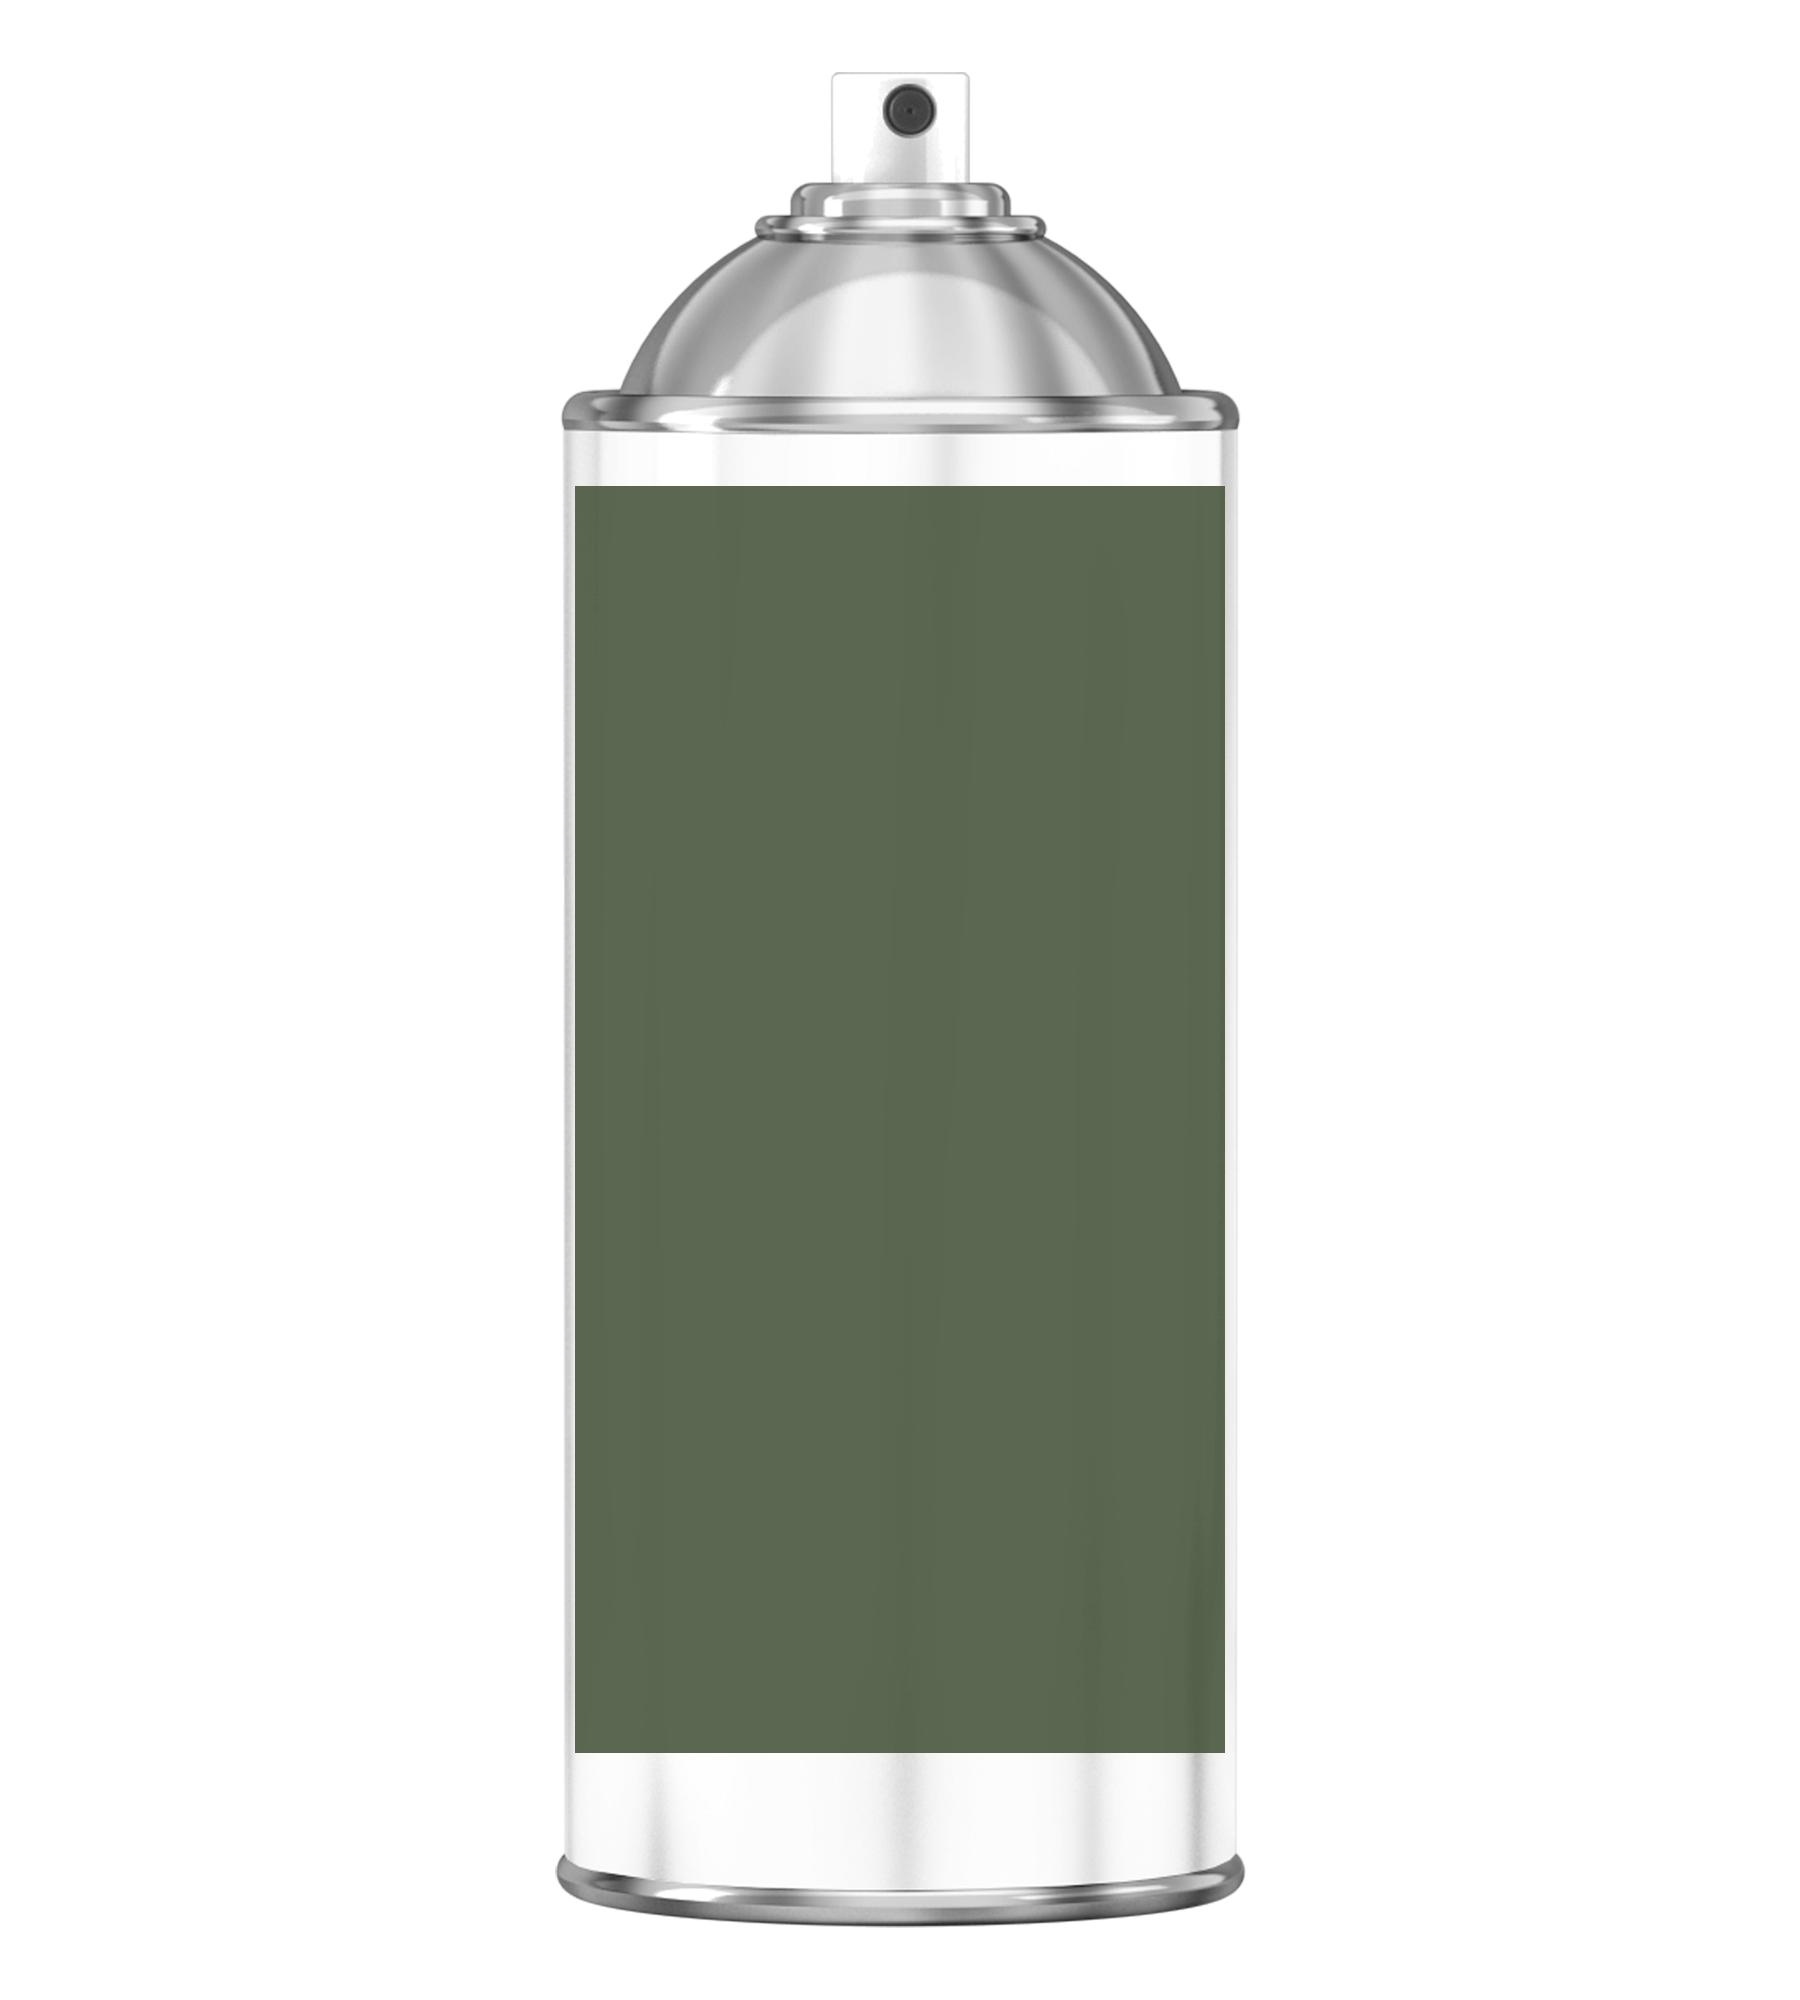 RAL 6003 olive green Sprayburk